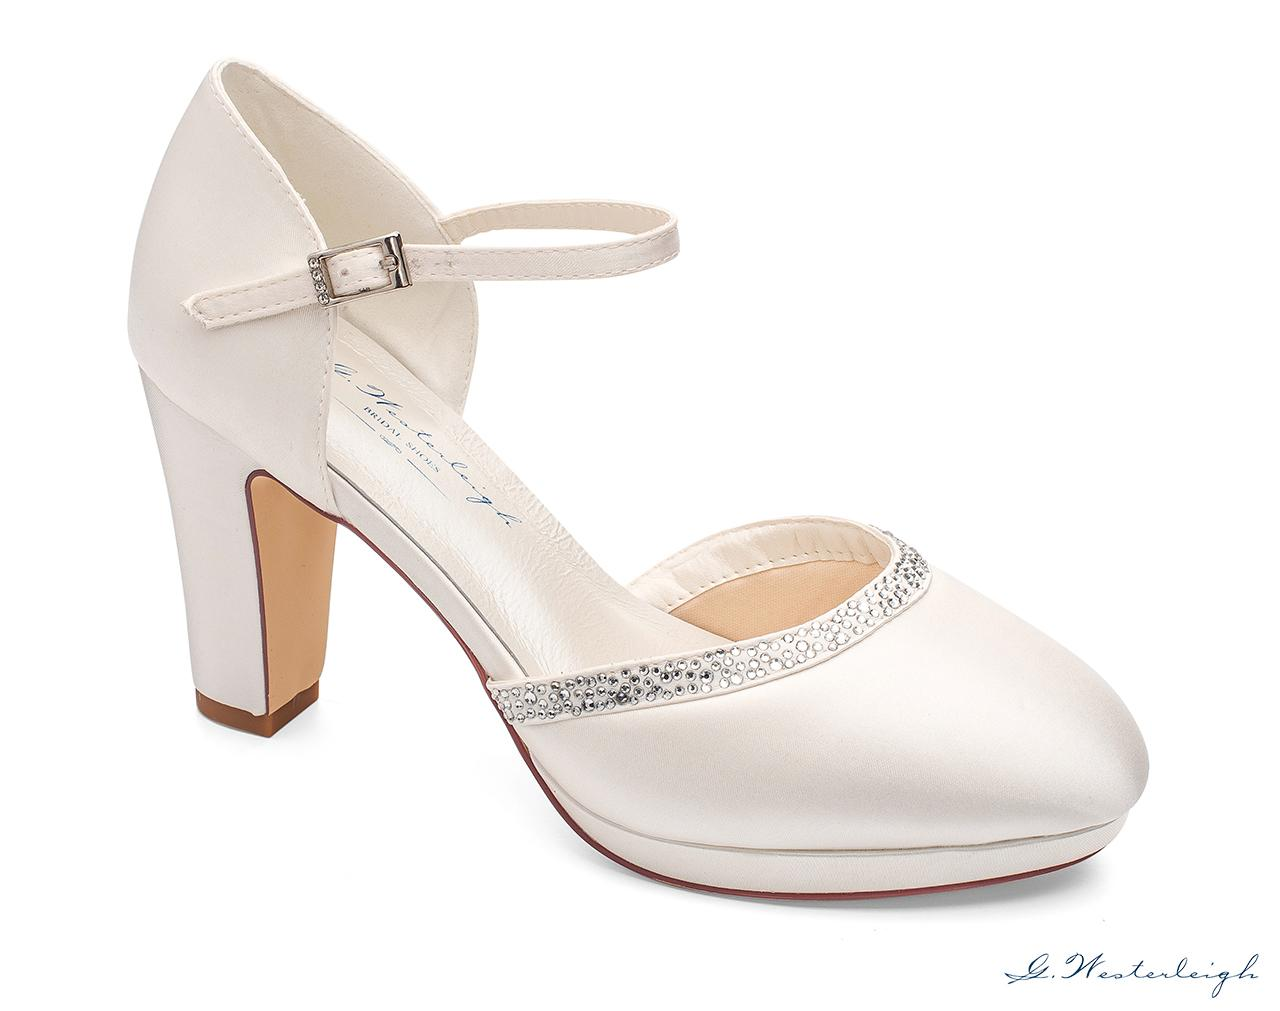 Svadobné topánky Gabrielle - Obrázok č. 1